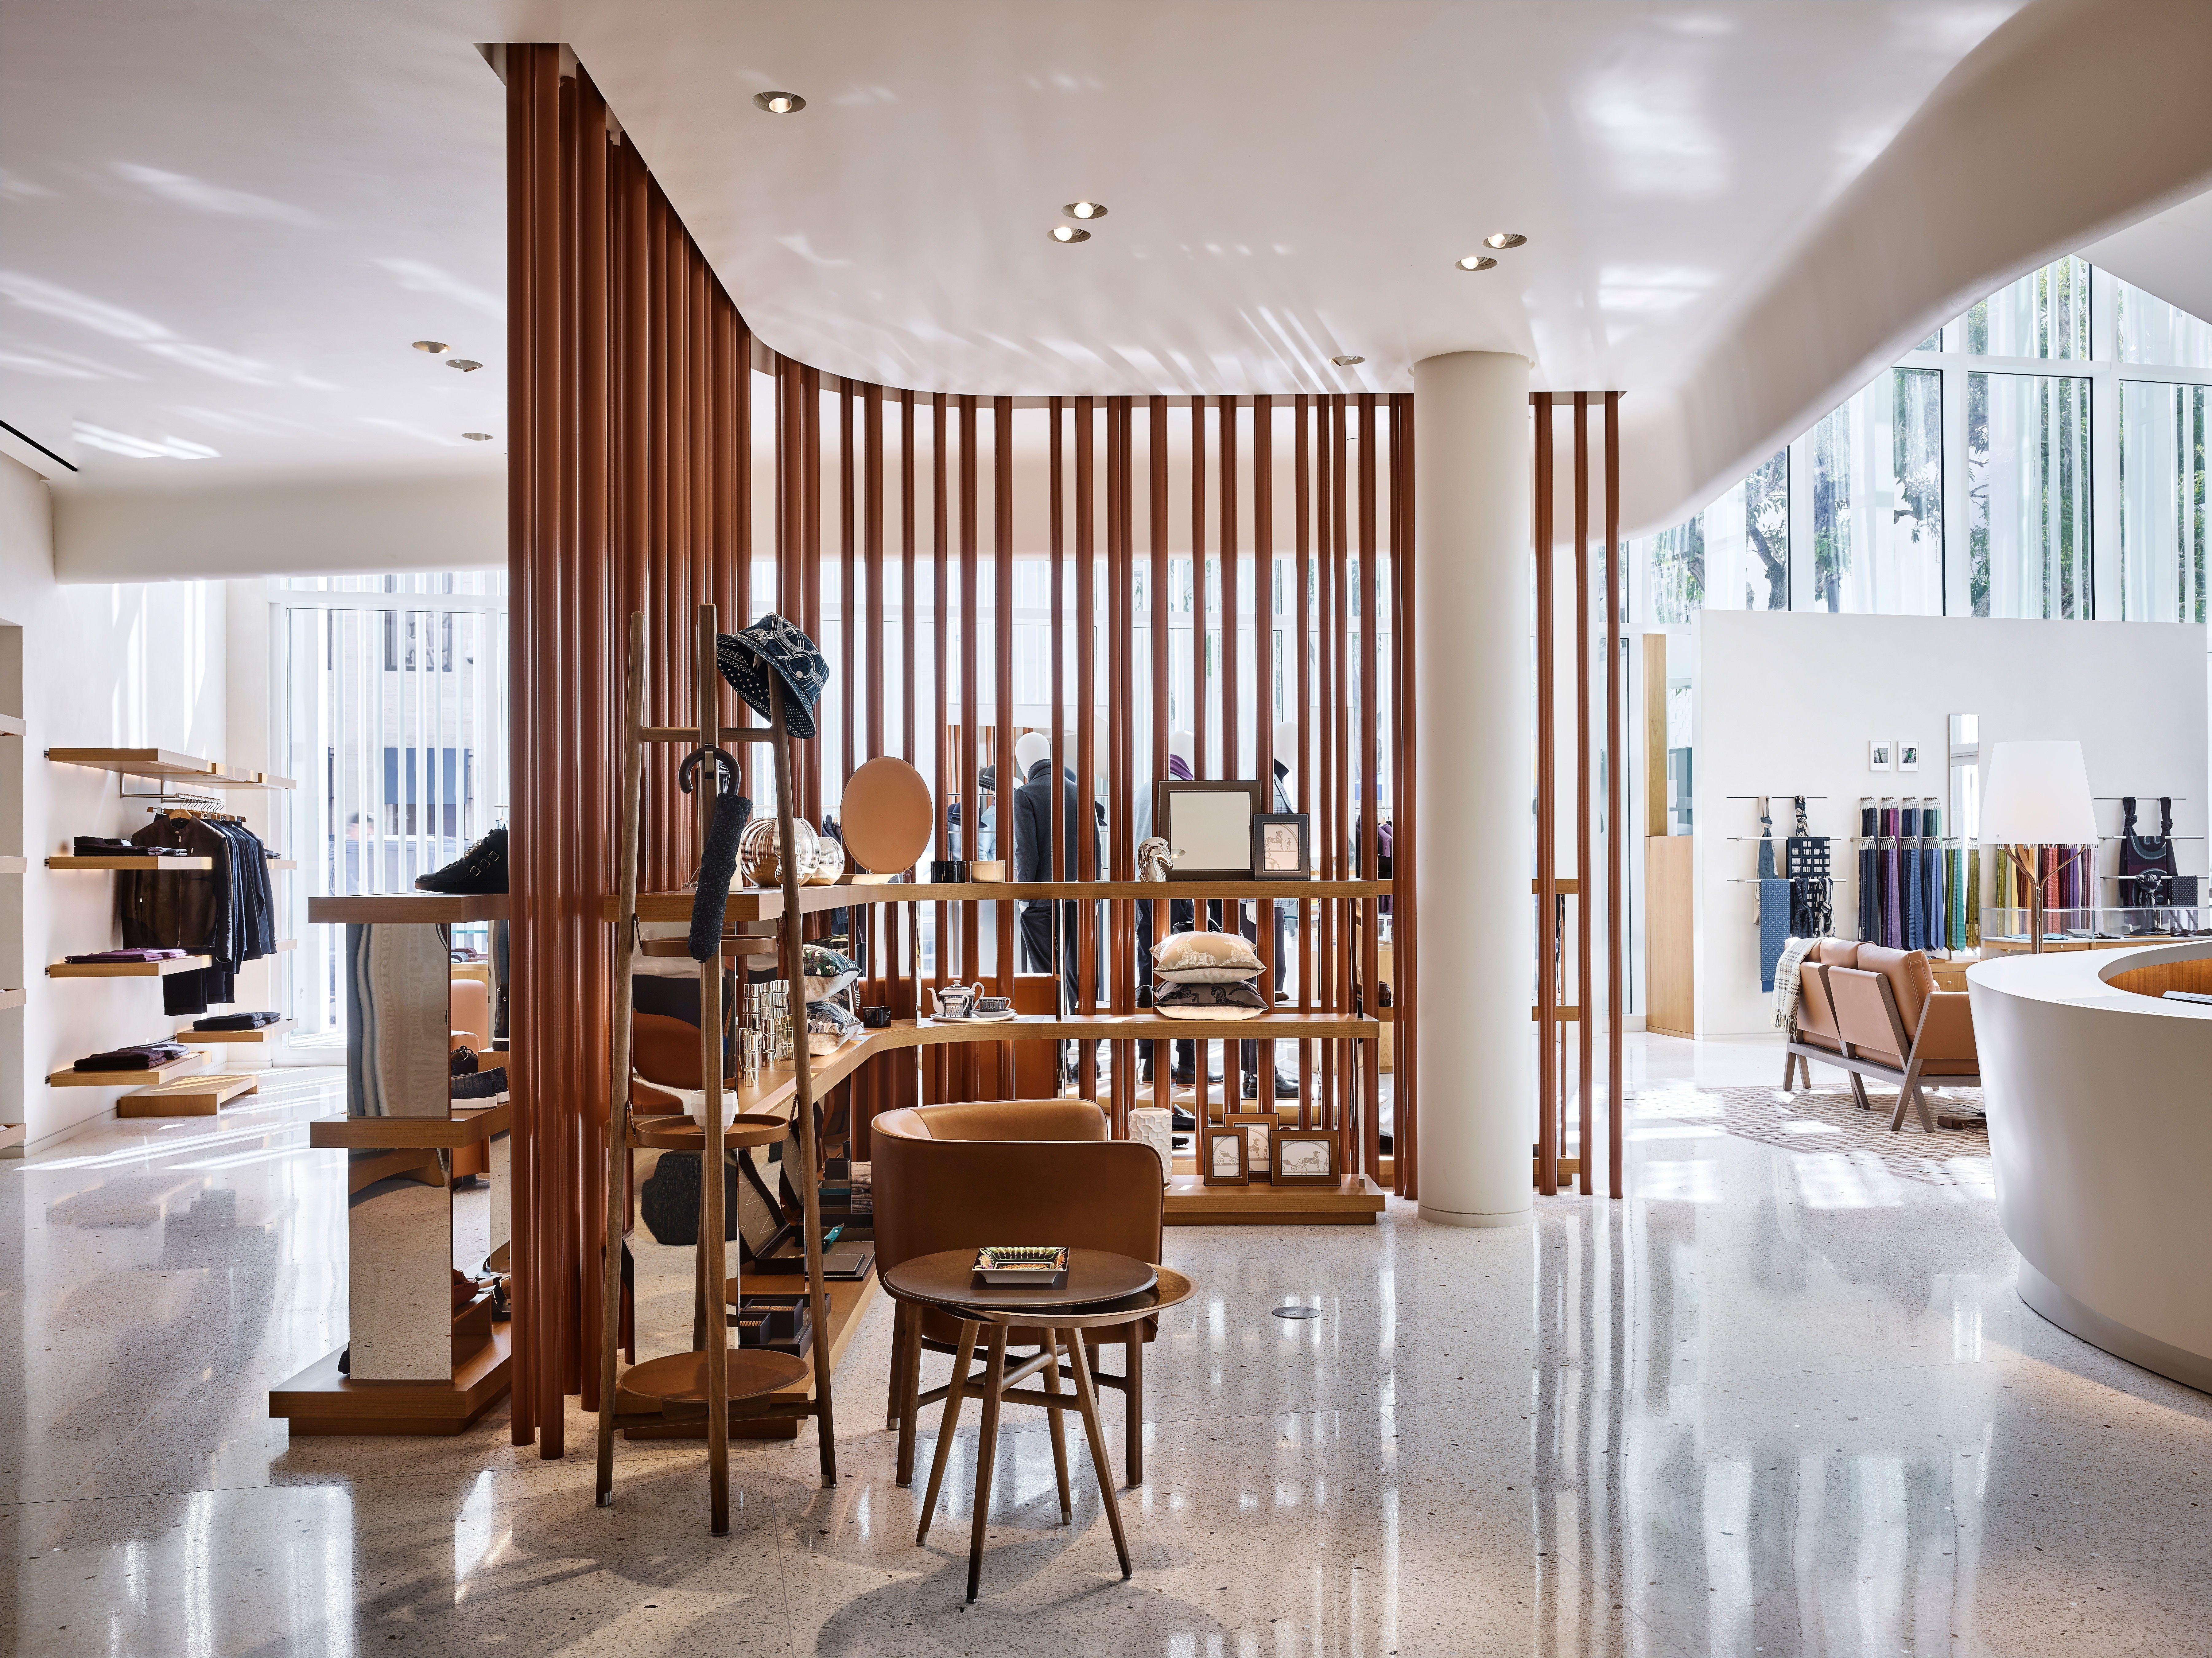 Hermès Opens a Striking New Shop in Miami's Design